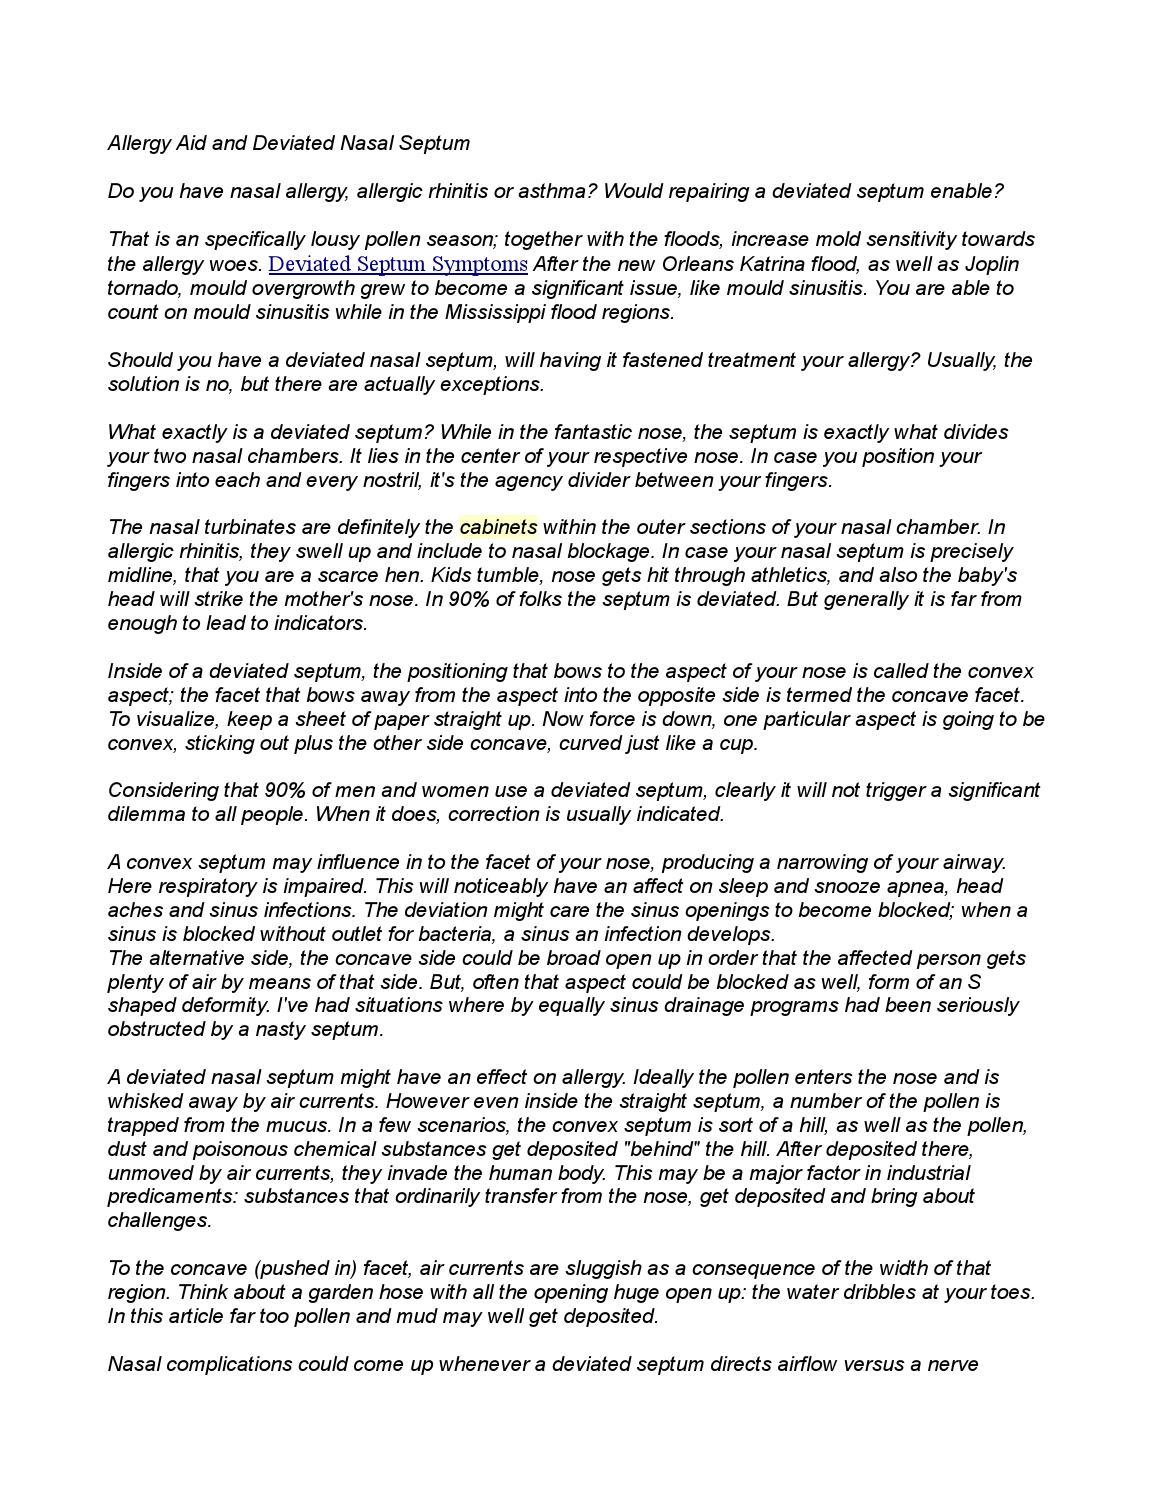 Deviated Septum Symptoms 2 By Holly5124 Issuu